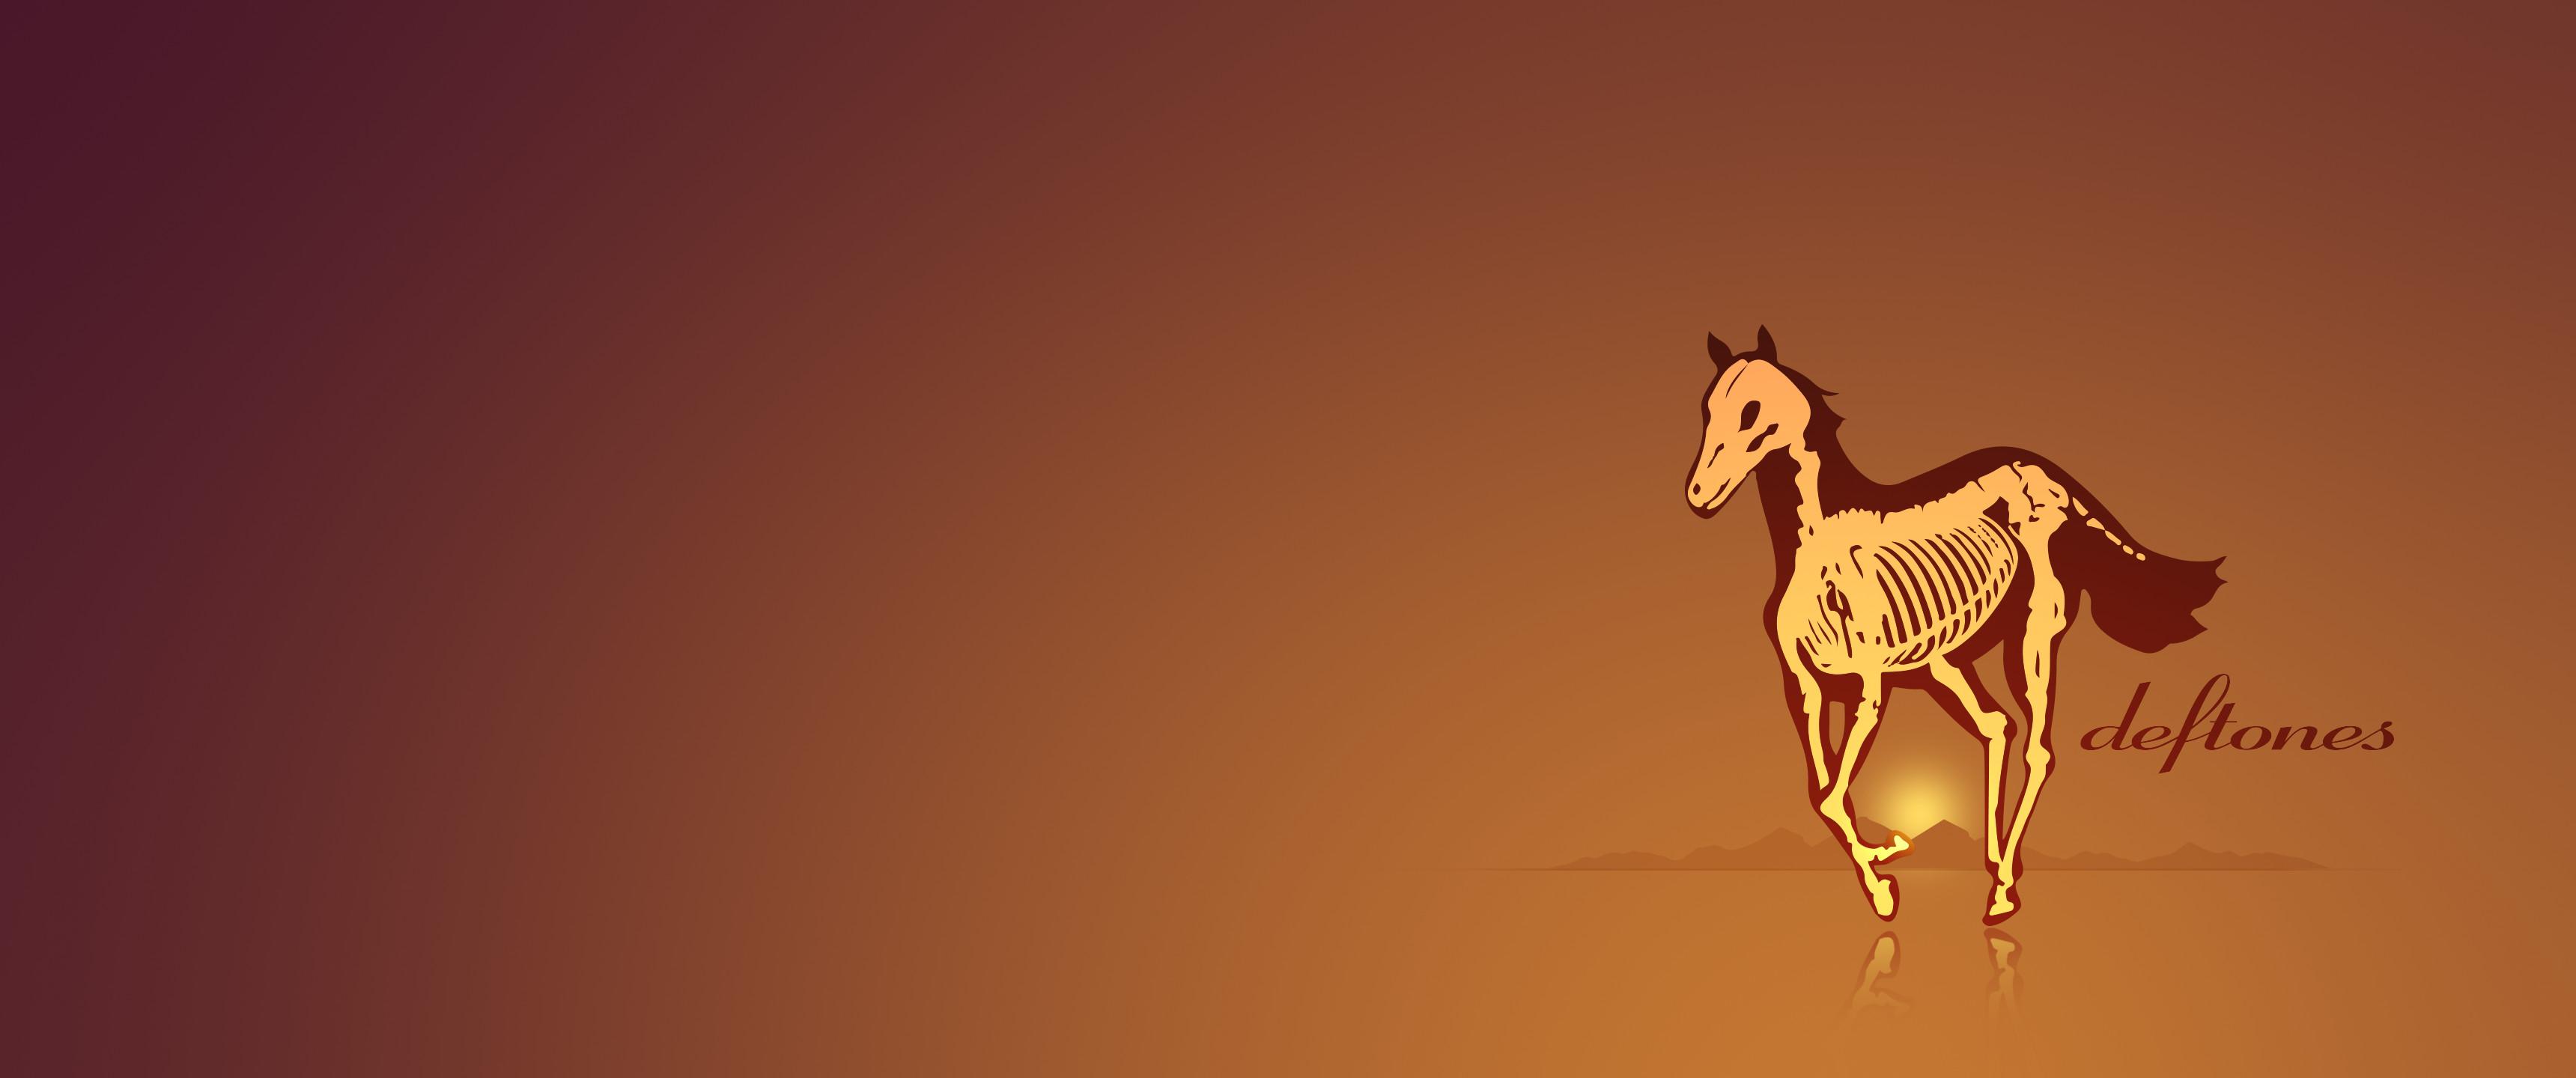 I created this Deftones Skeleton Pony Ultrawide Minimalist Wallpaper. Hope  you dig it!